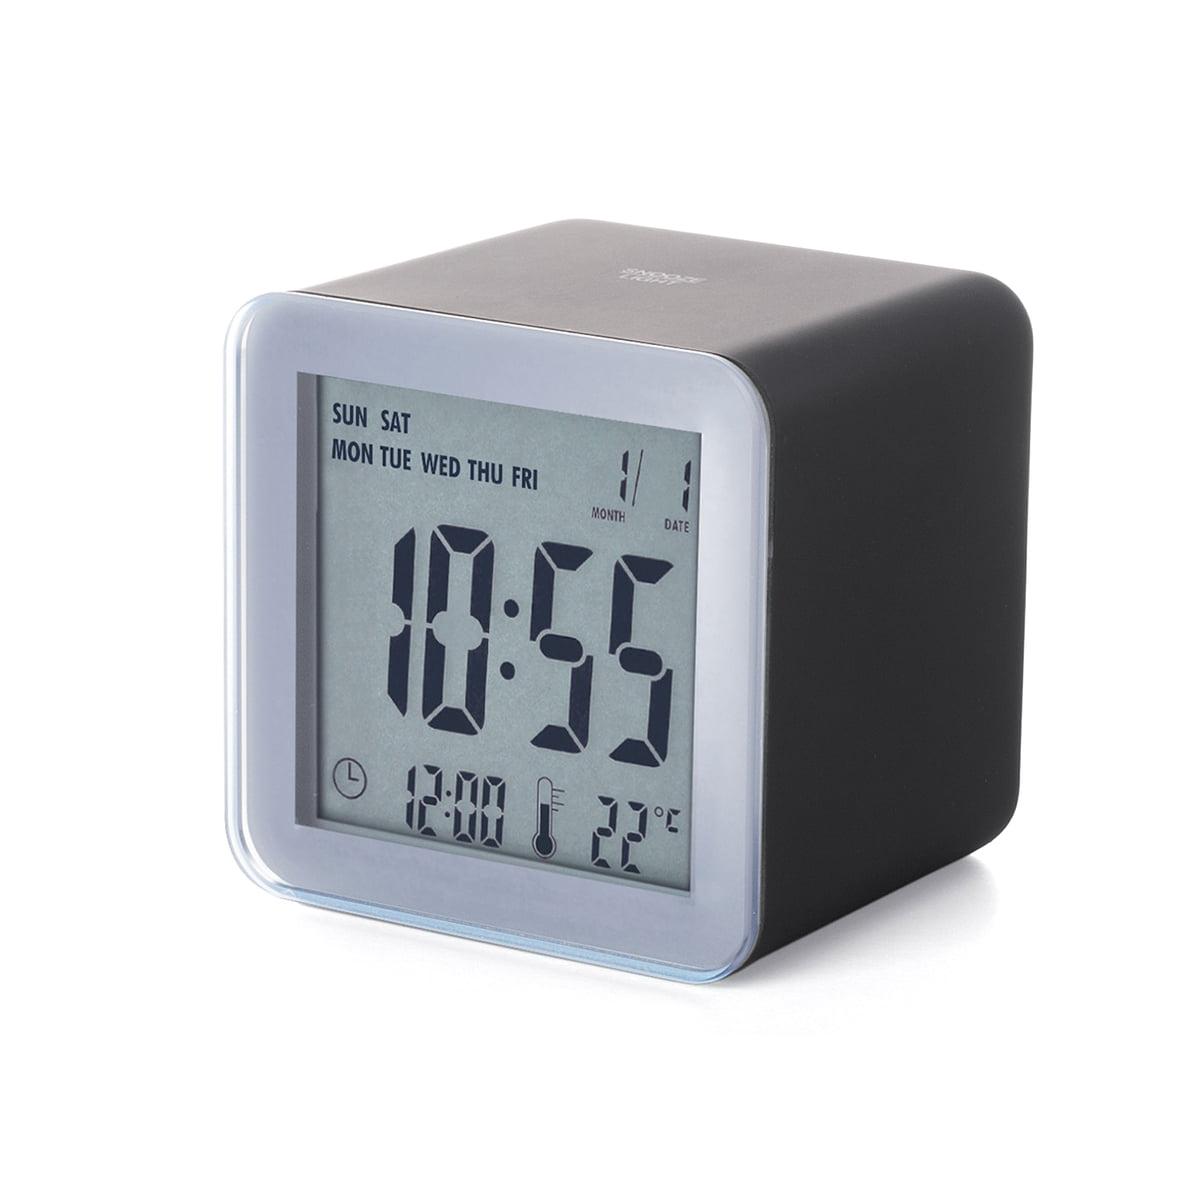 cube sensor lcd alarm clock  lexon  shop - lexon  cube sensor lcd alarm clock aluminium black